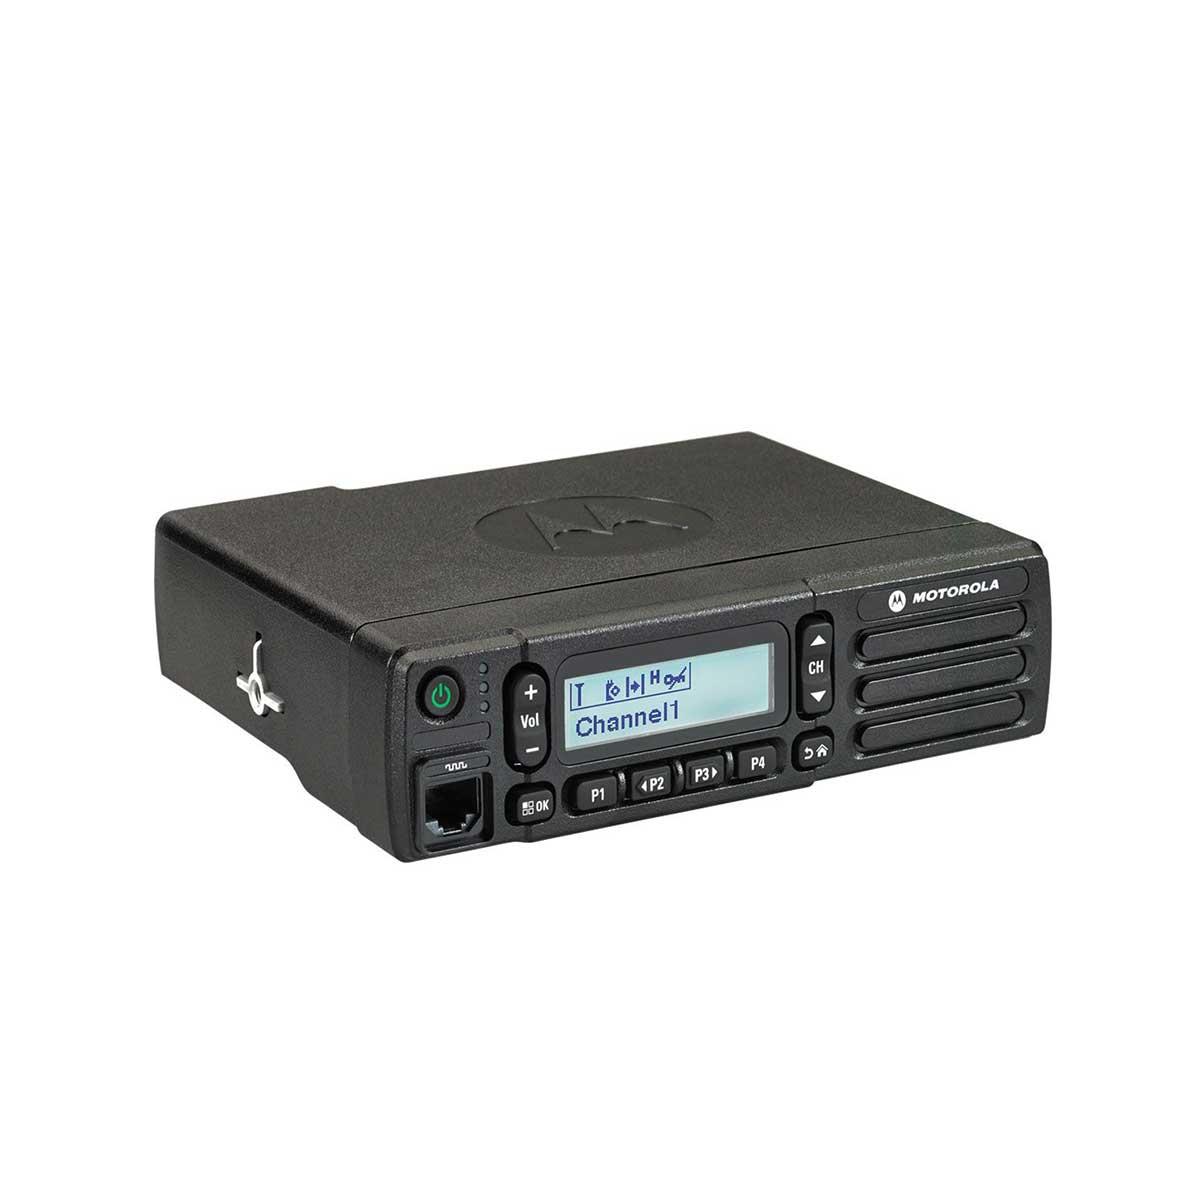 Radio Motorola DEM500 Digital LAM02QPH9JA1AN UHF 403-470 MHZ de 40W